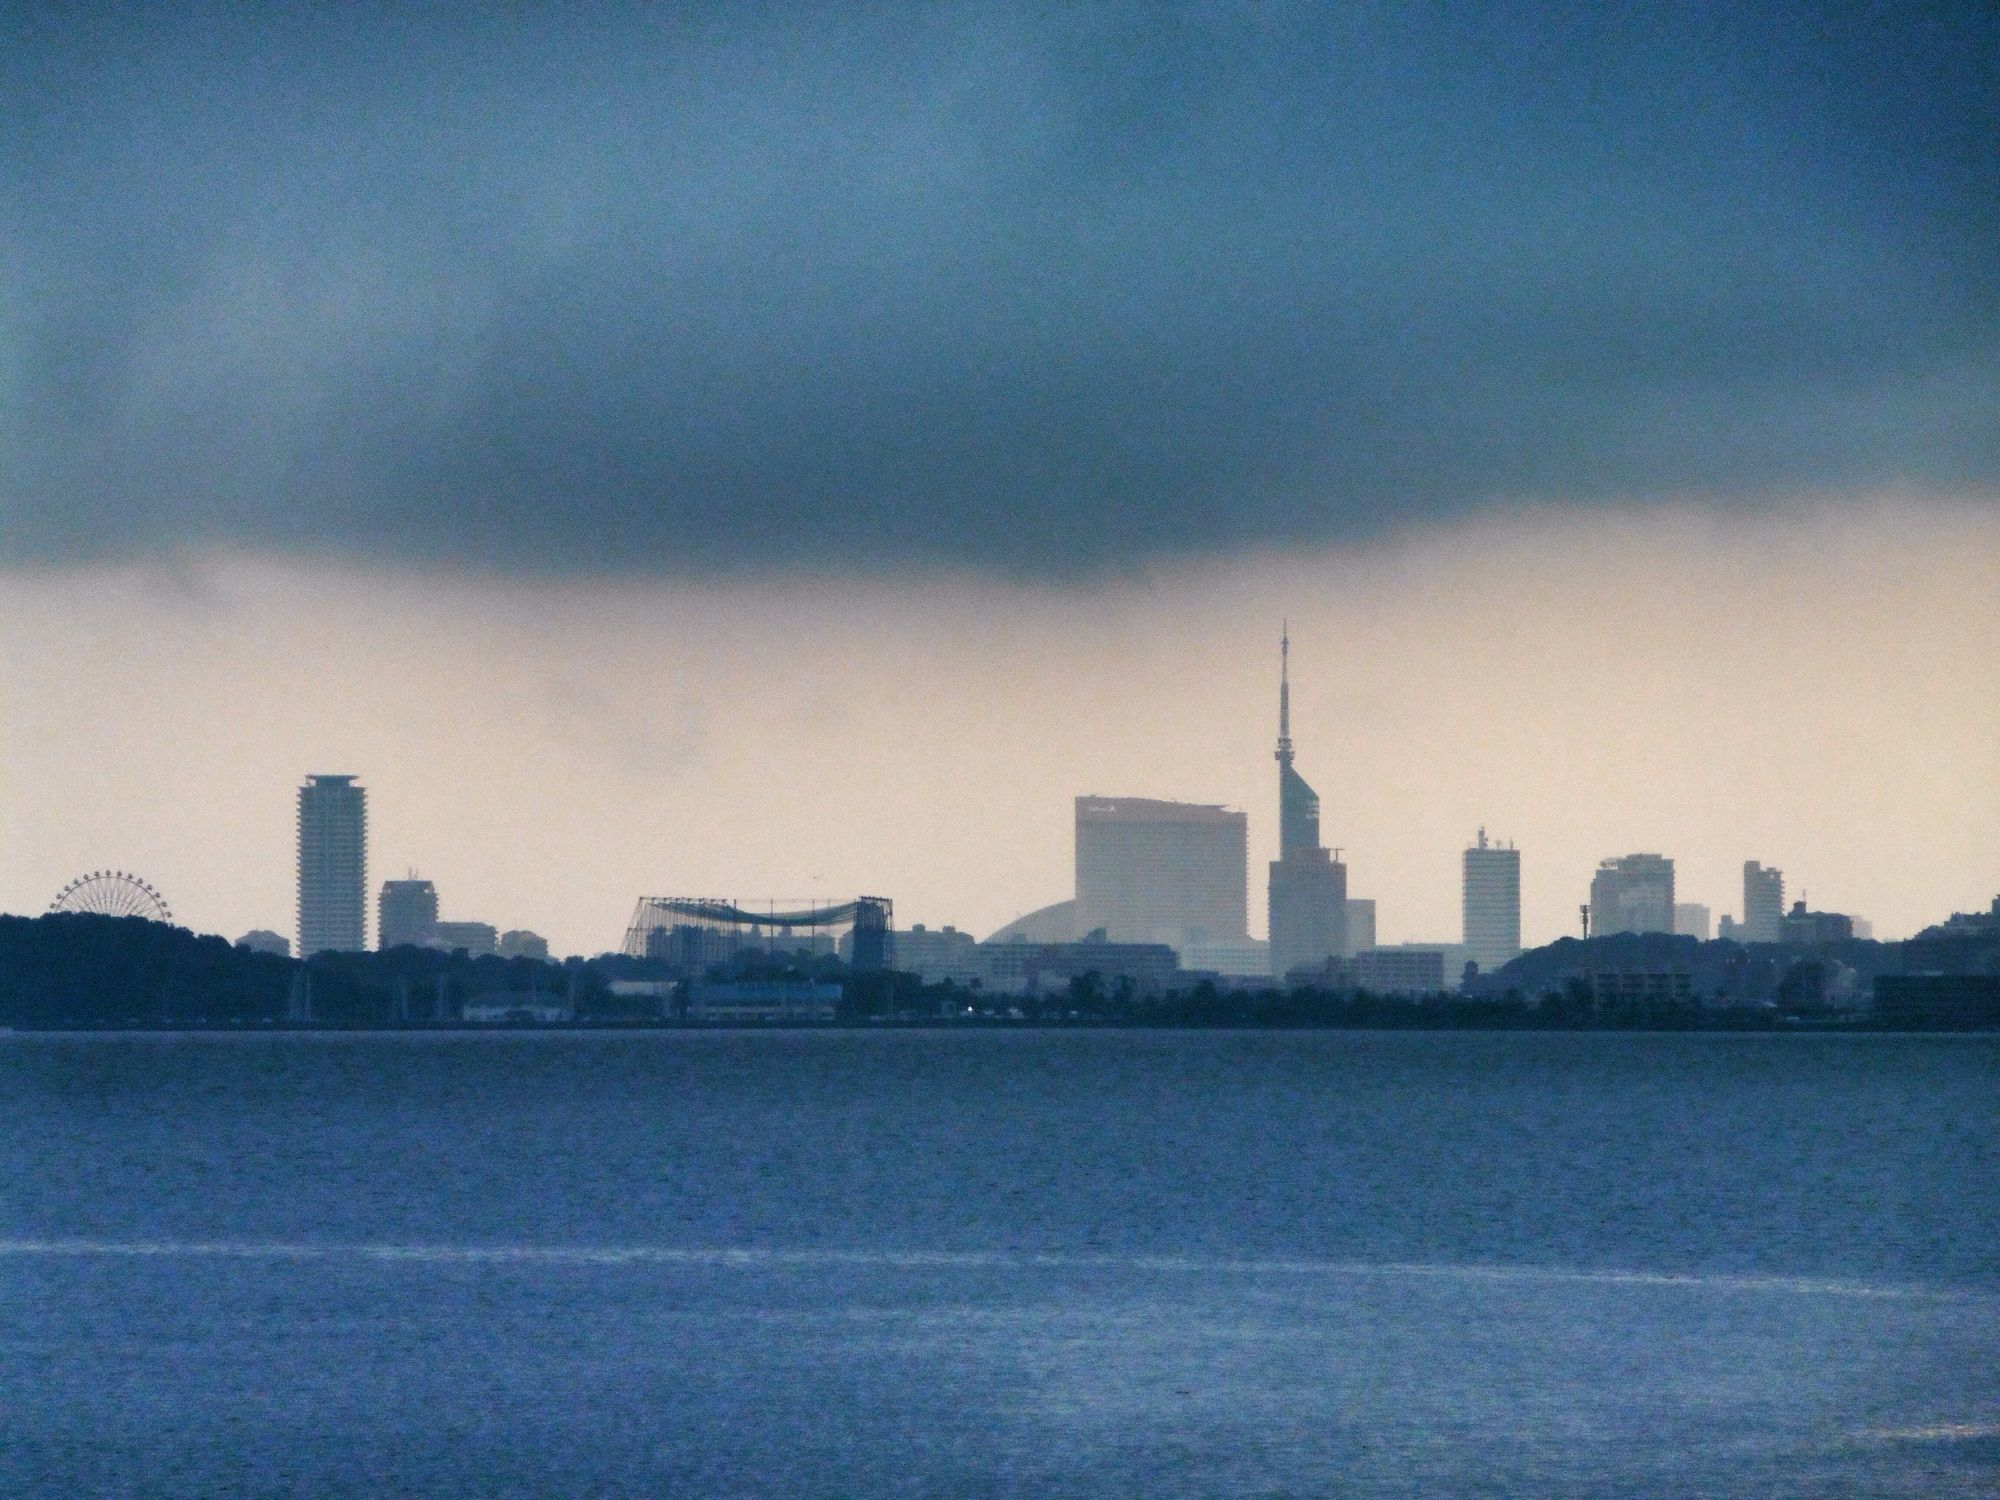 27 July 6:23 雨が上がっていく博多湾沿いの福岡タワー群。切り絵のようです。 ( Morning Now at Hakata bay in Japan )